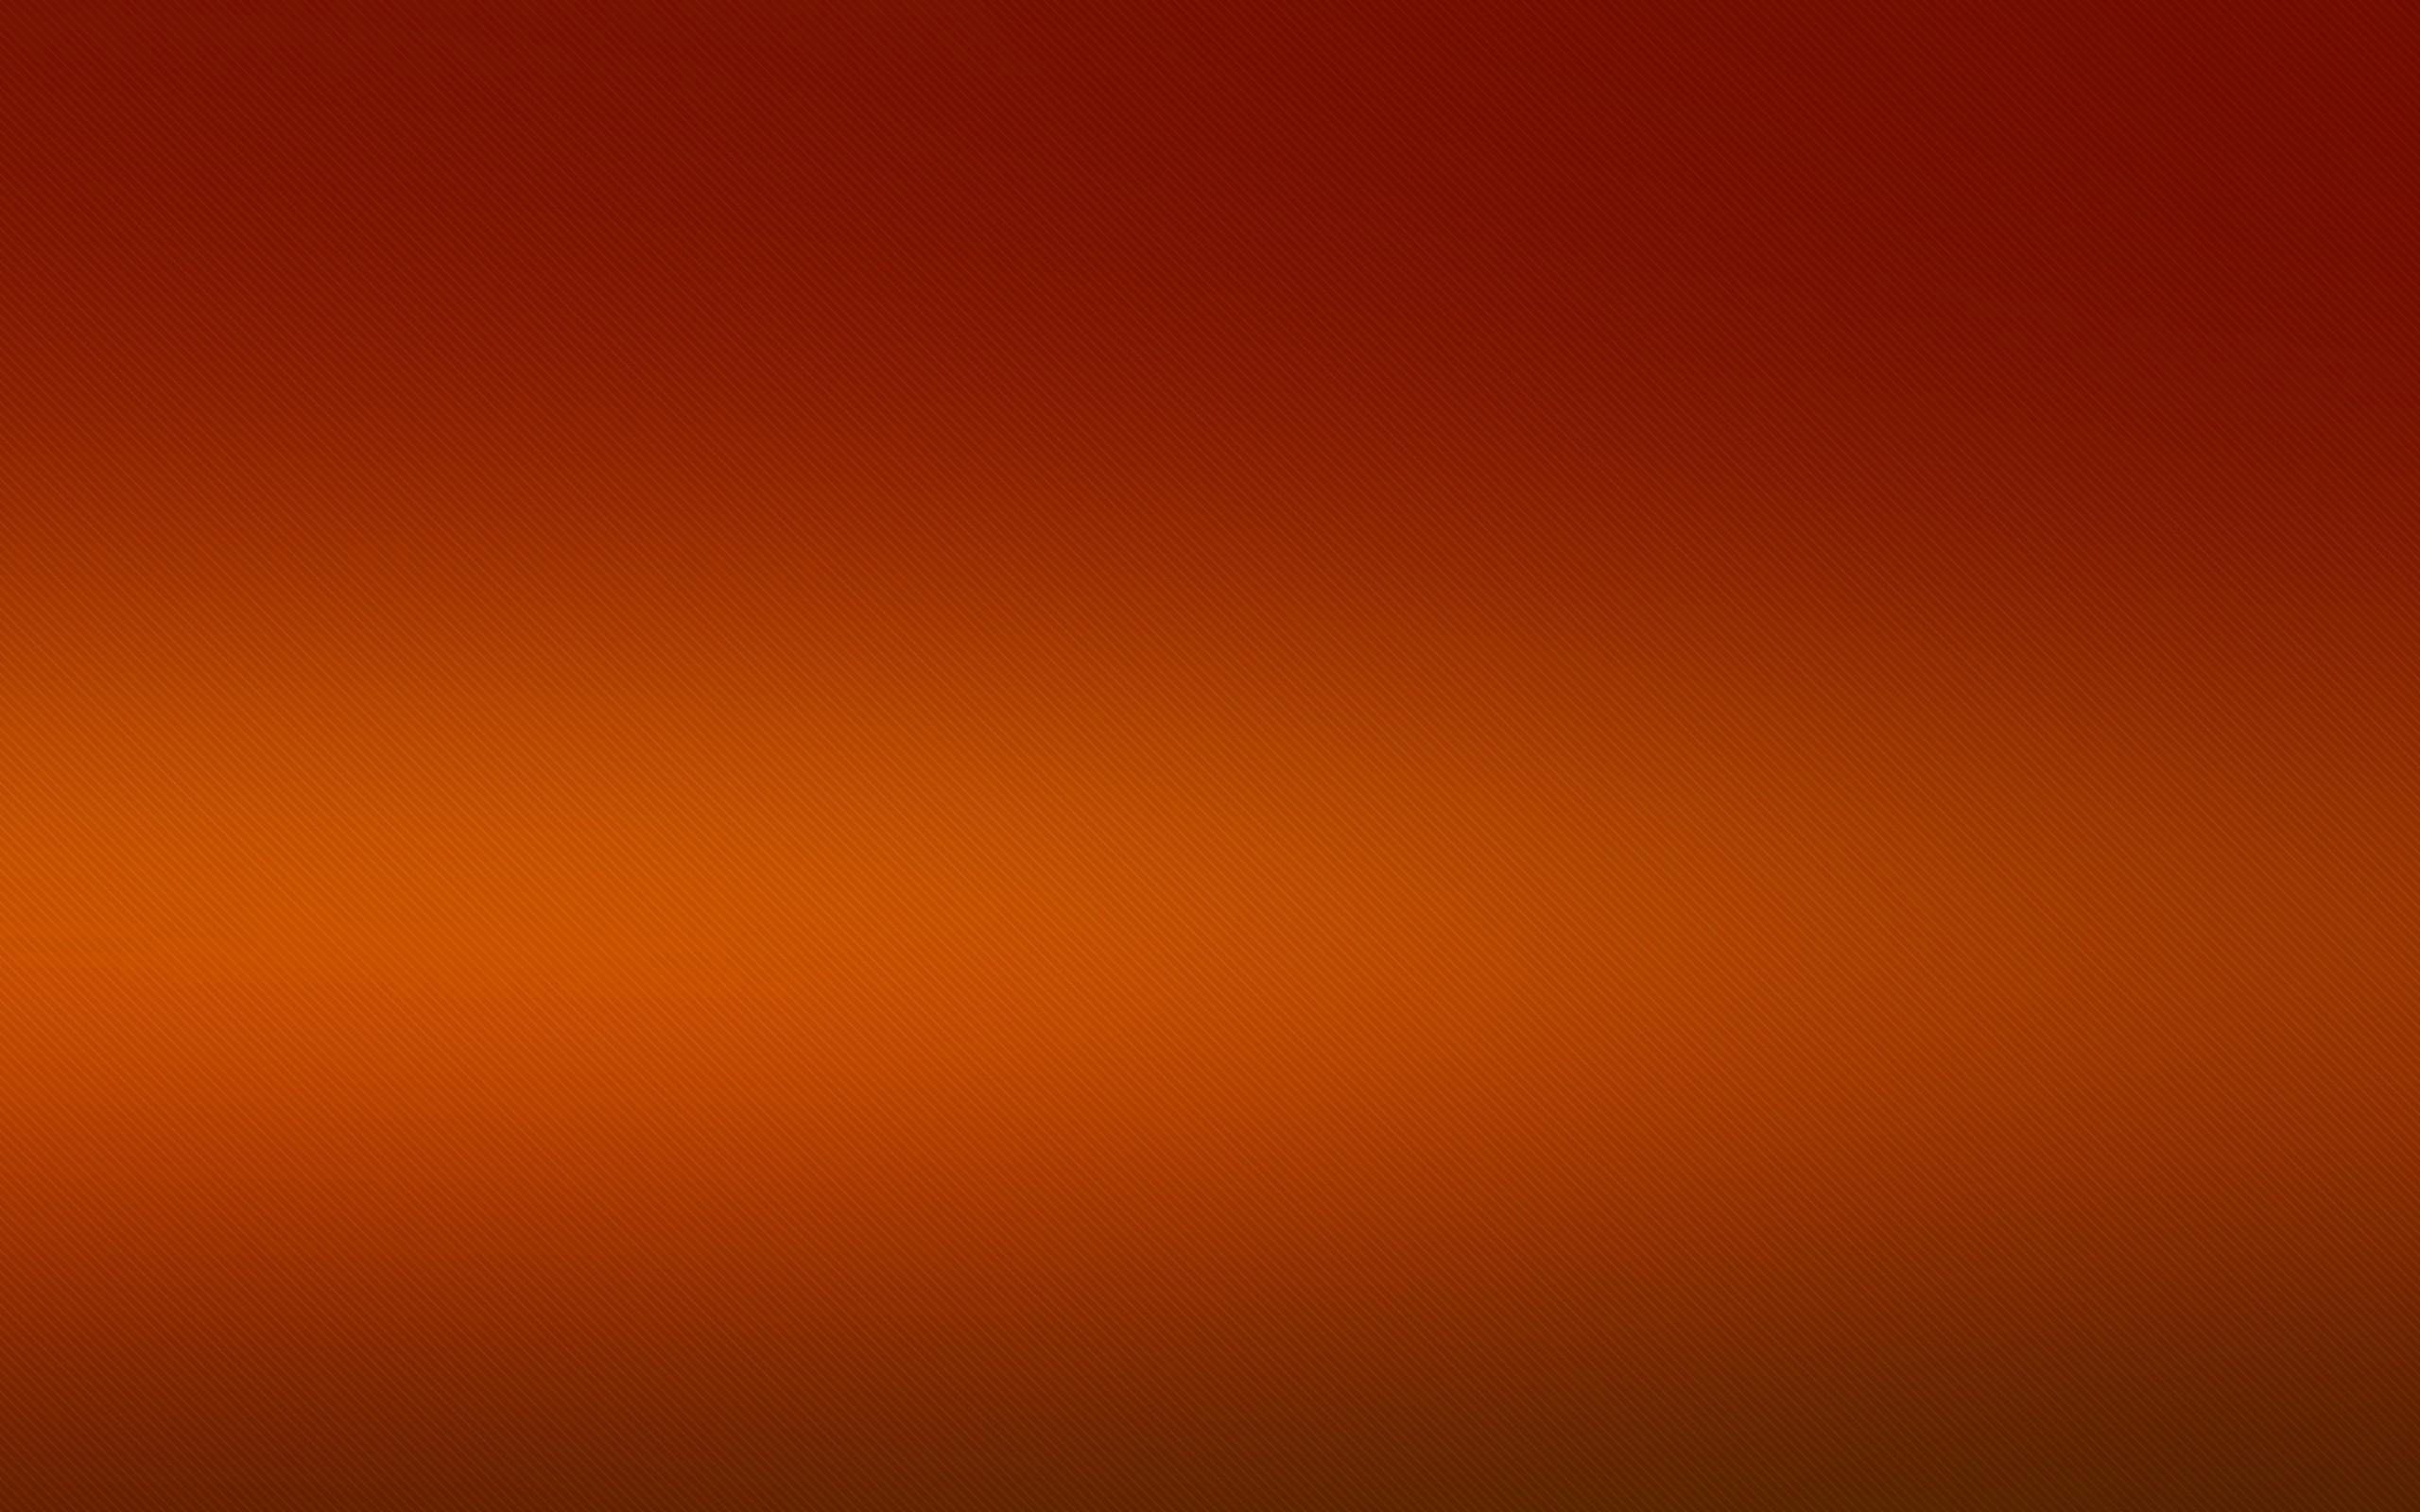 Abstract Orange Wallpaper 2560x1600 Abstract Orange Gradient 2560x1600